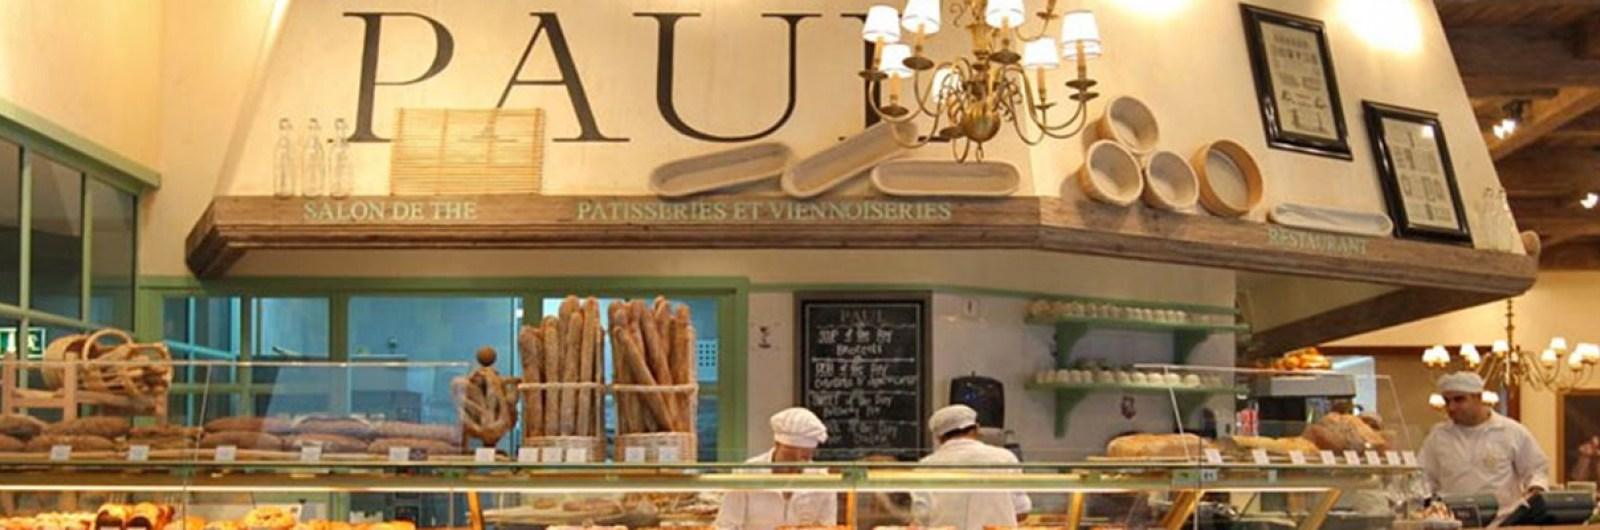 pastelaria francesa paul